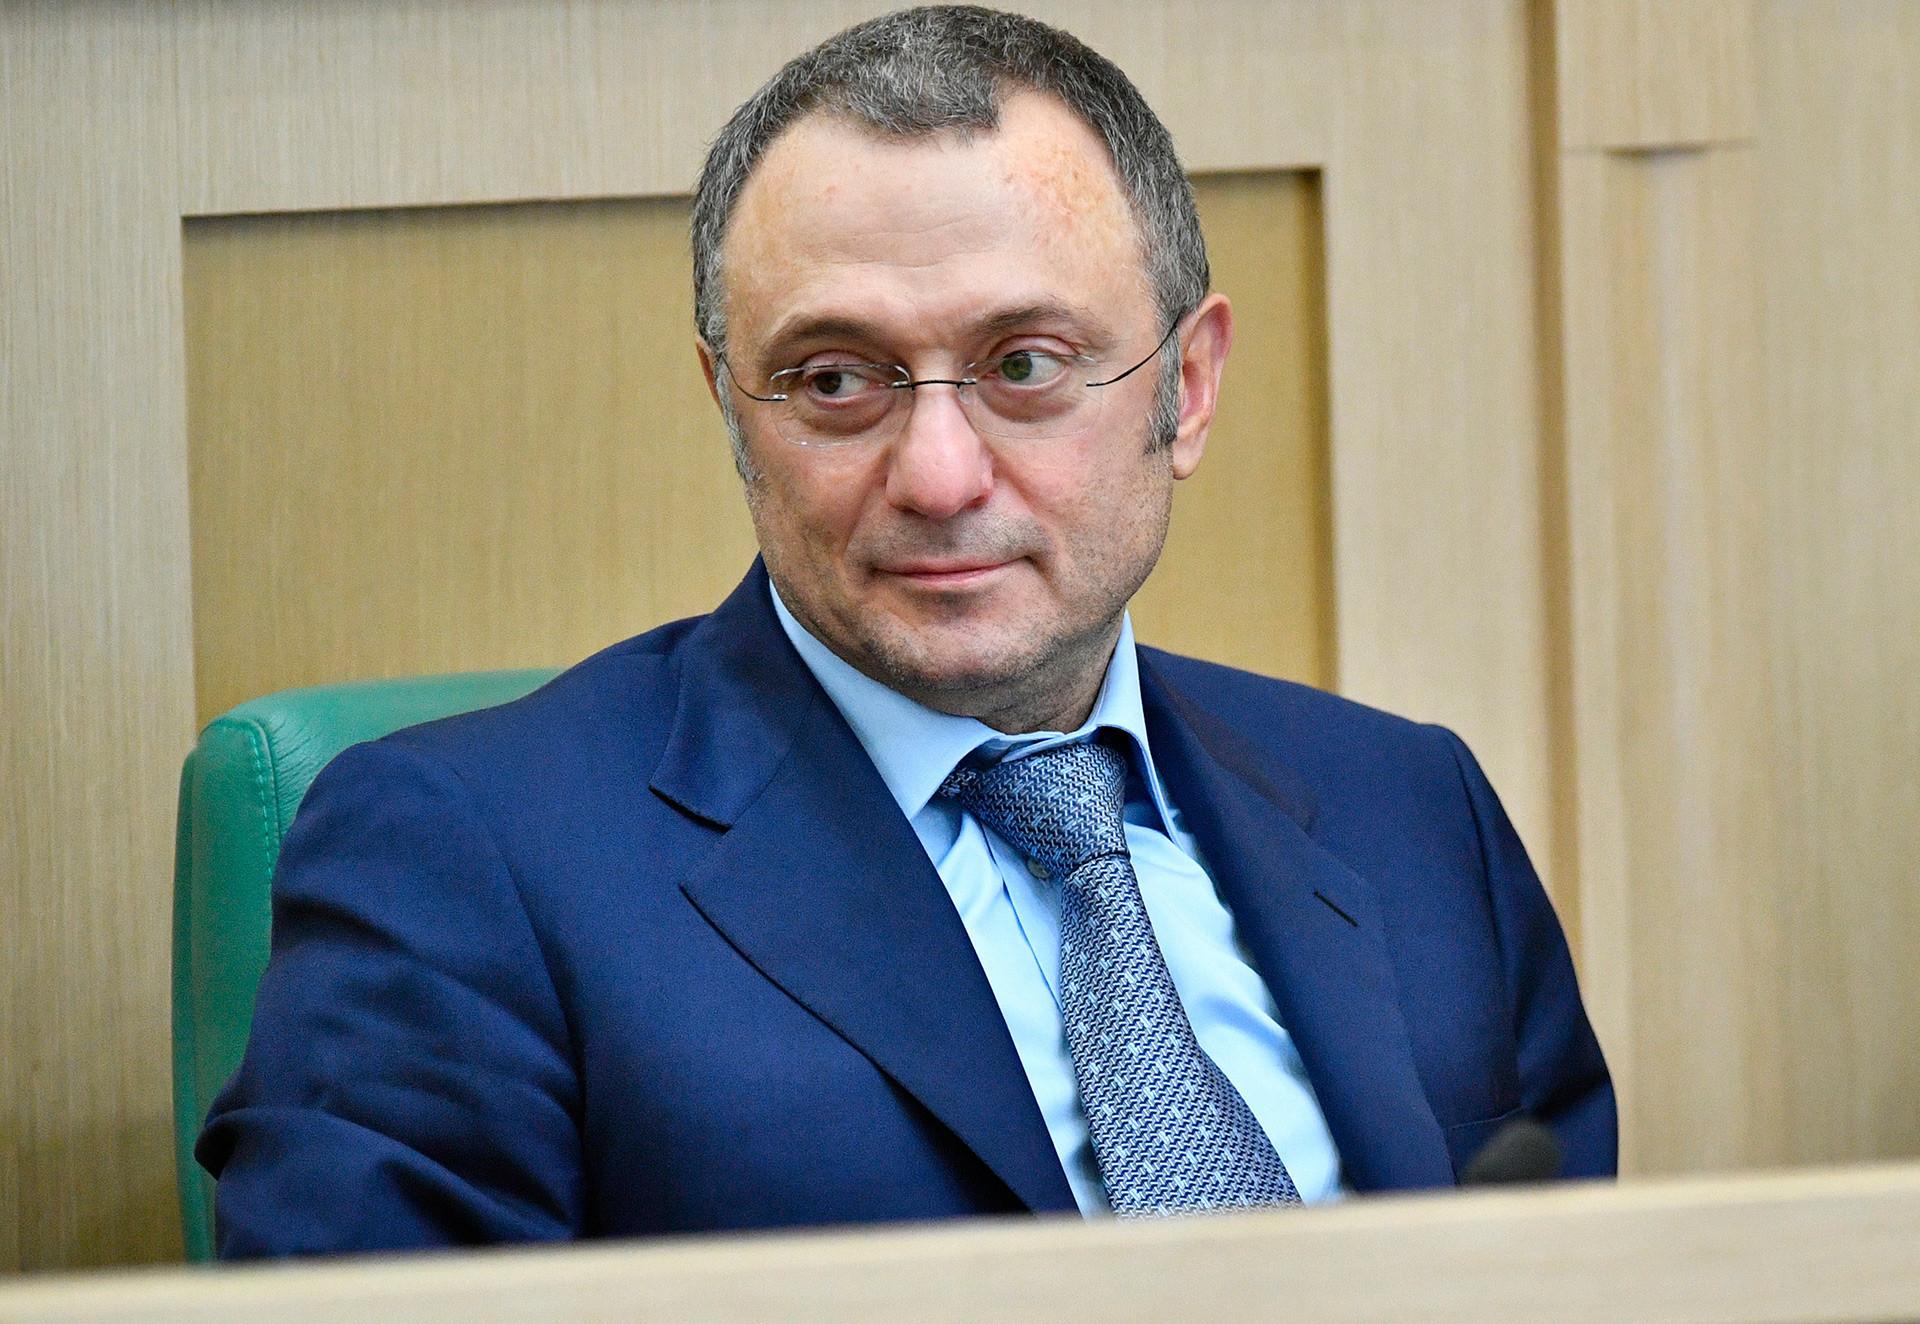 Suleiman Kerimov, mantan pemilik Anzhi Makhachkala yang menjadi tokoh di balik penjualan pemain-pemain besar, seperti Willian dan Samuel Eto'o. Ia menjual klubny pada 2016.